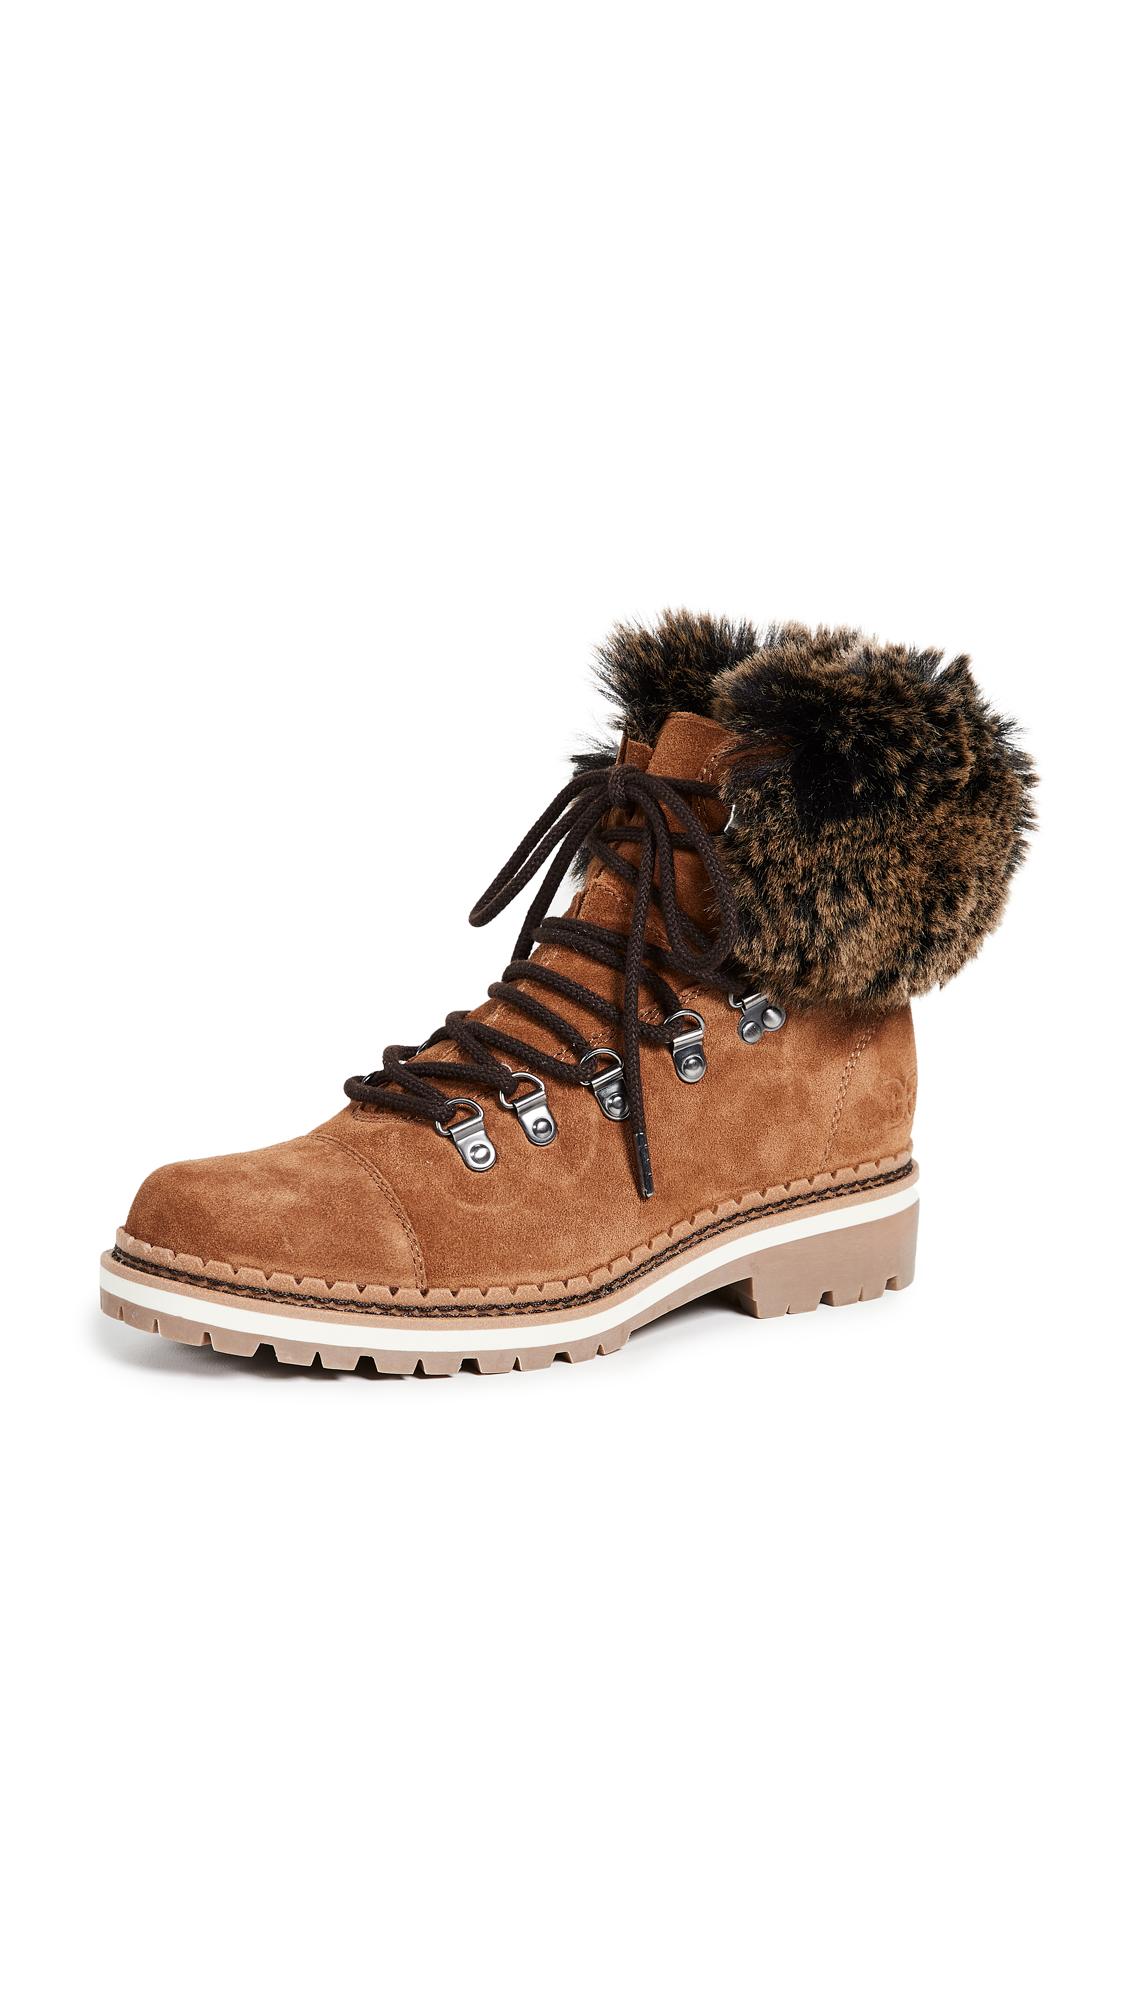 Sam Edelman Bowen Boots - Luggage/Cognac Multi